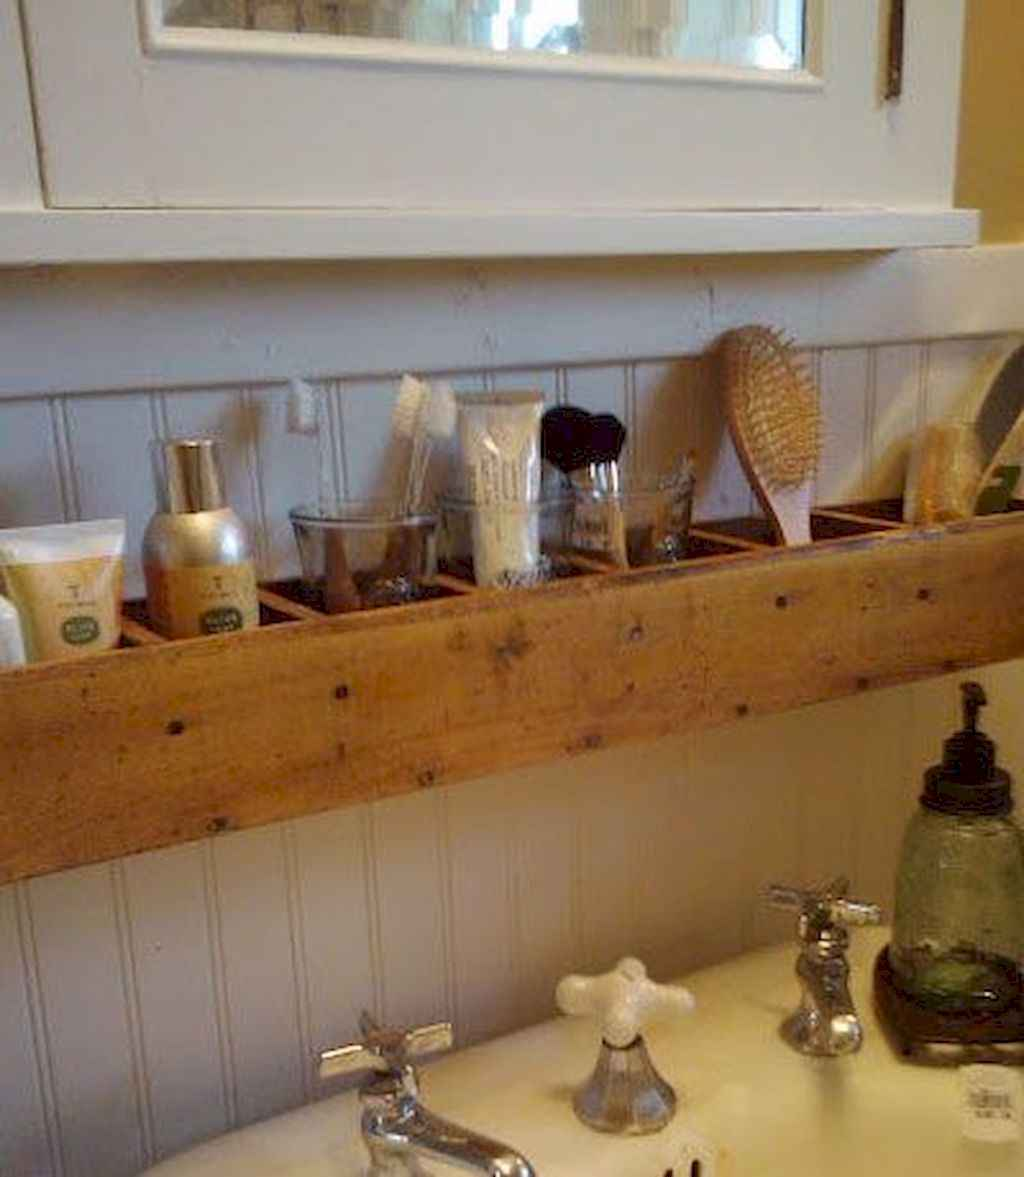 111 Brilliant Small Bathroom Remodel Ideas On A Budget (89)